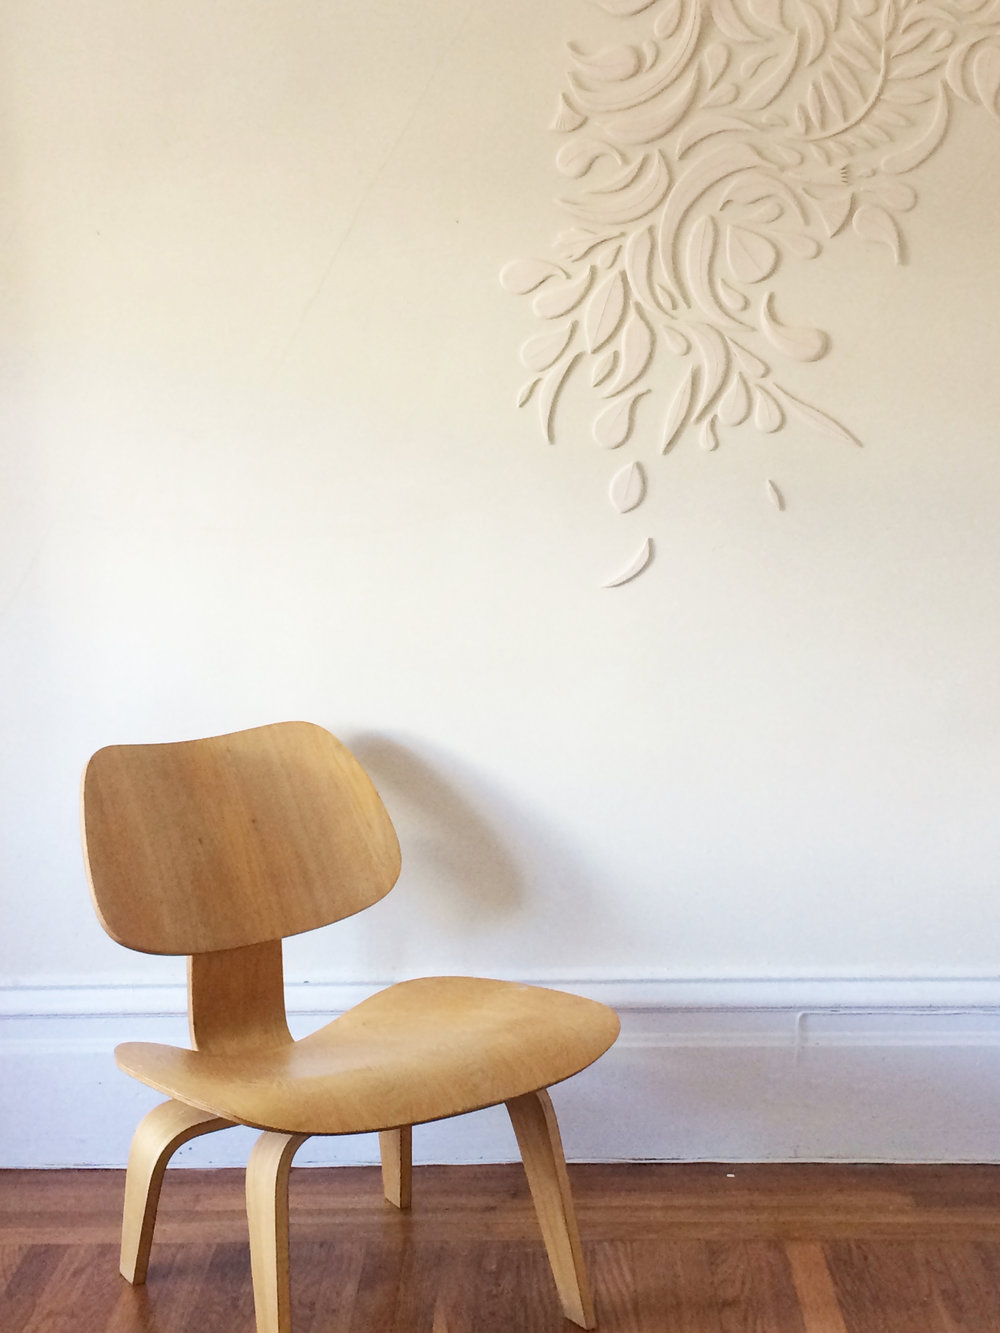 Porcelain-Wallpaper-Eames-Anastasia-Tumanova.jpg